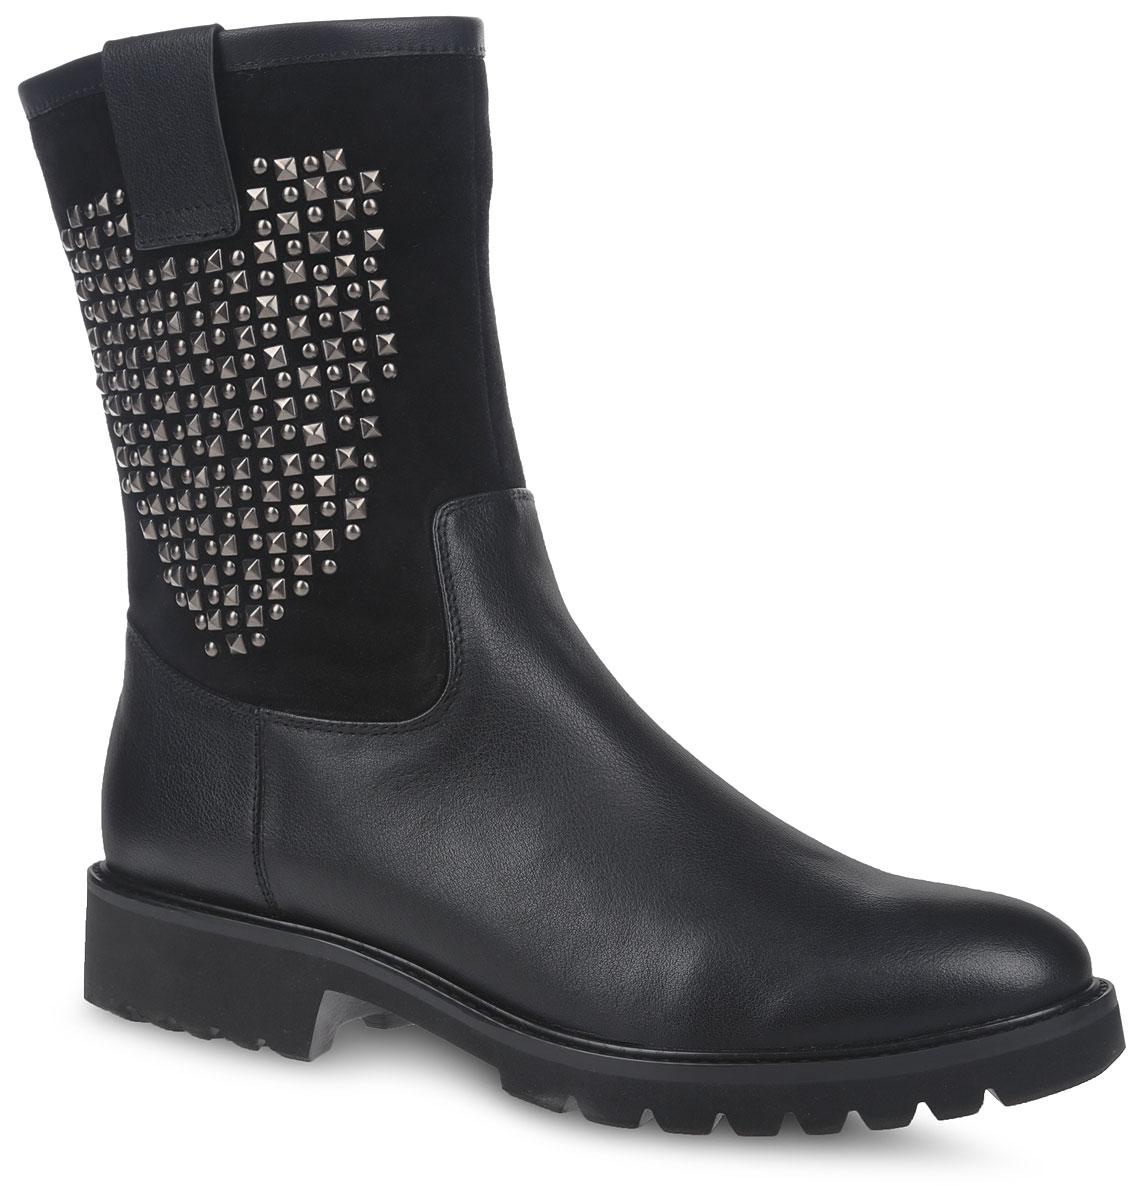 Ботинки женские. 62033-1RLS62033-1RLS